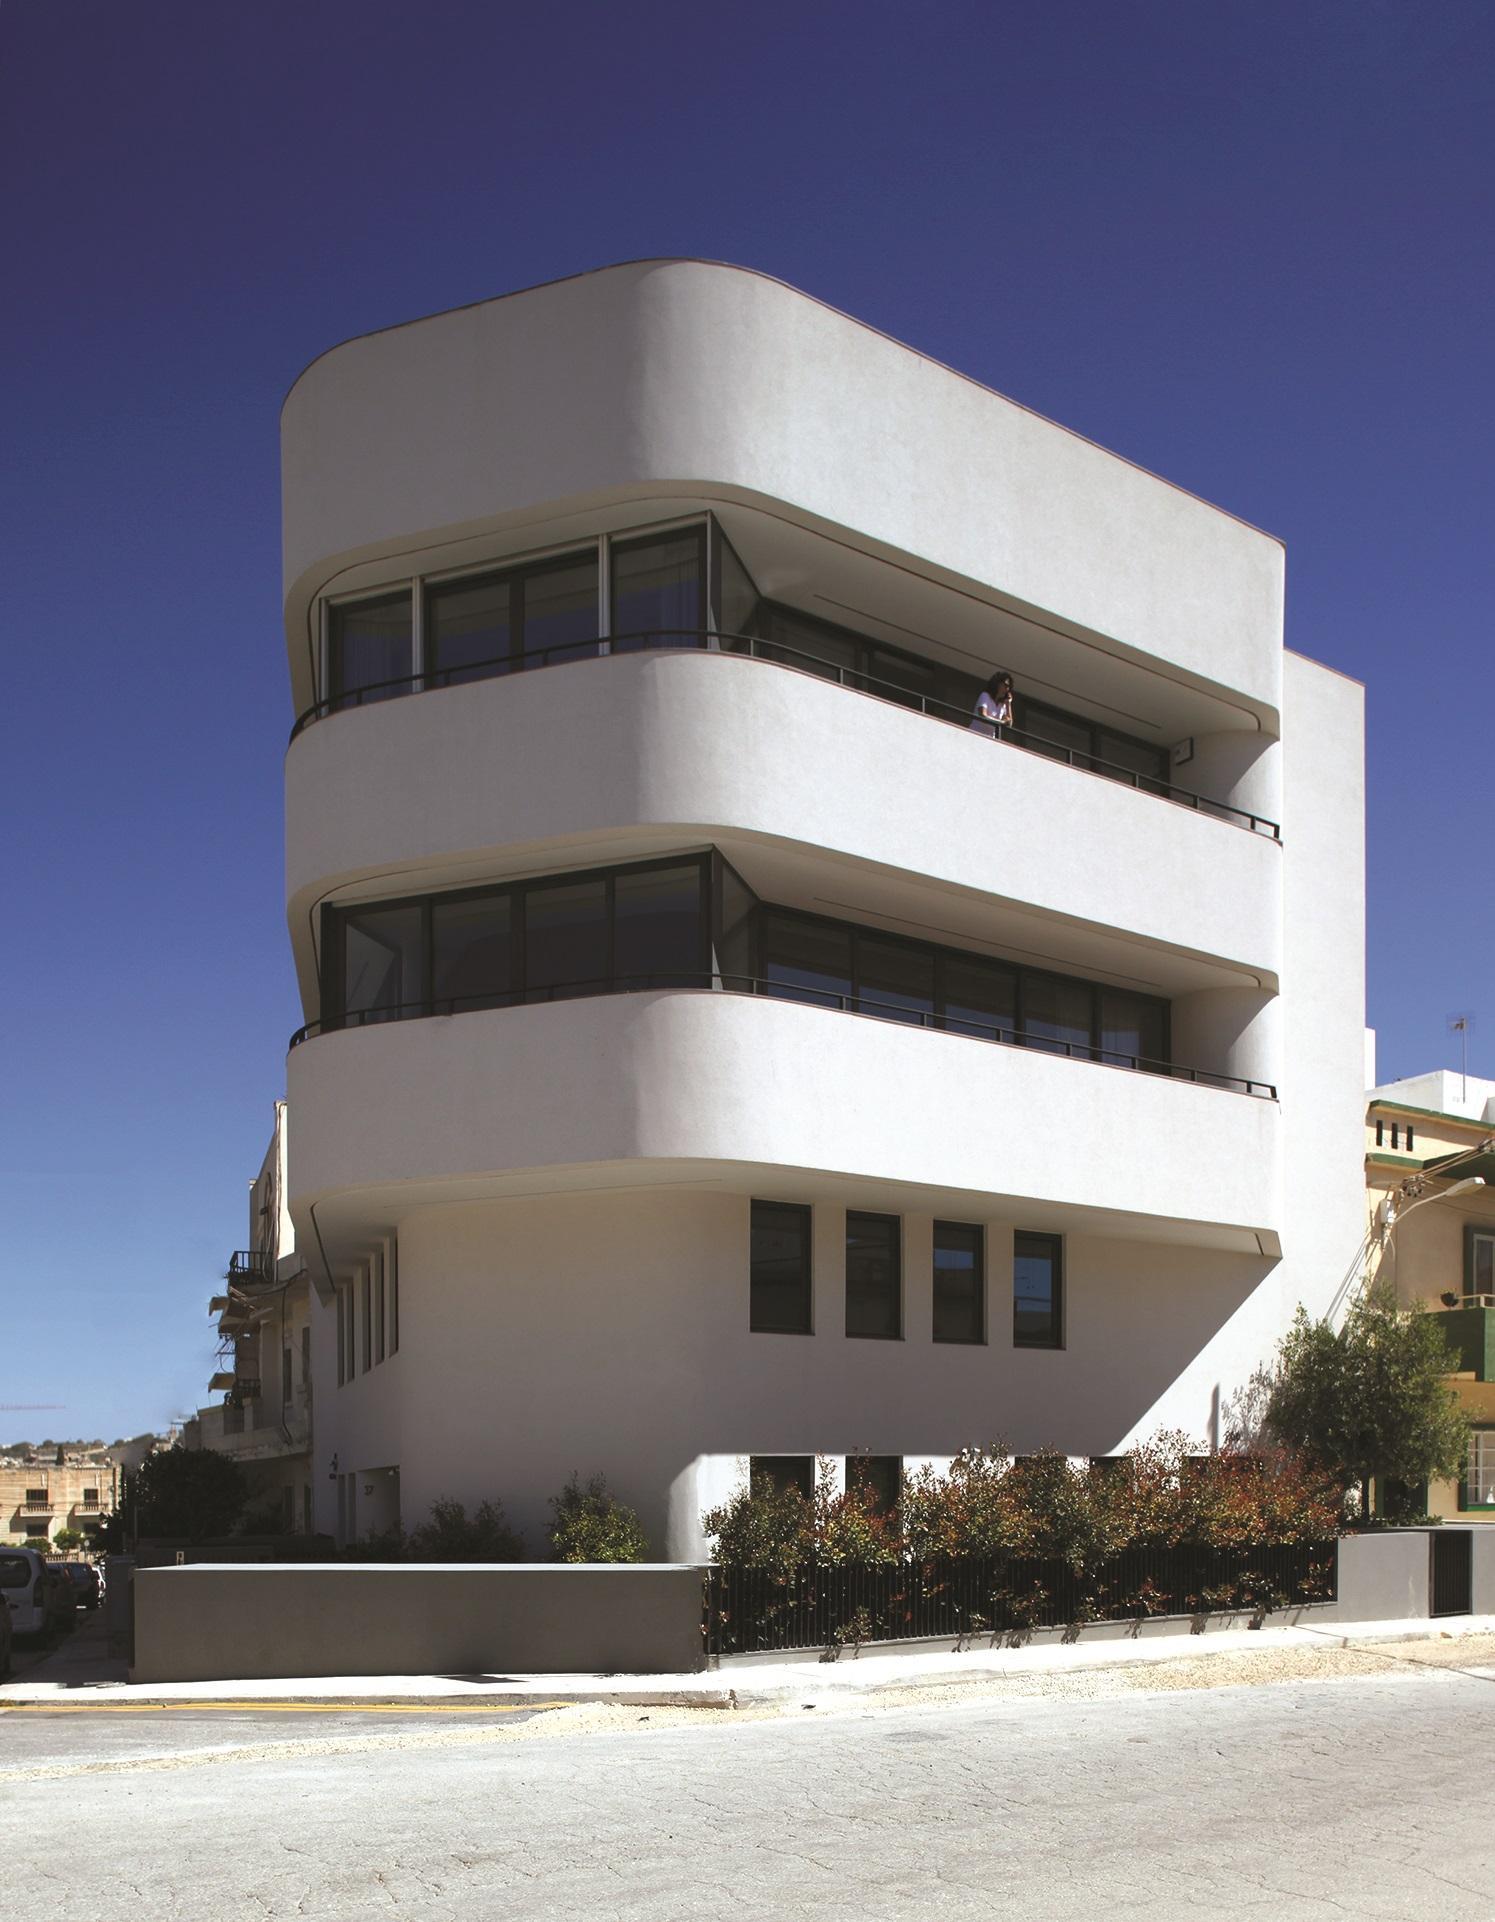 Threeplusone, Balzan: a low-rise apartment block designed to respond to surrounding context and orientation. Photo: Julian Vassallo